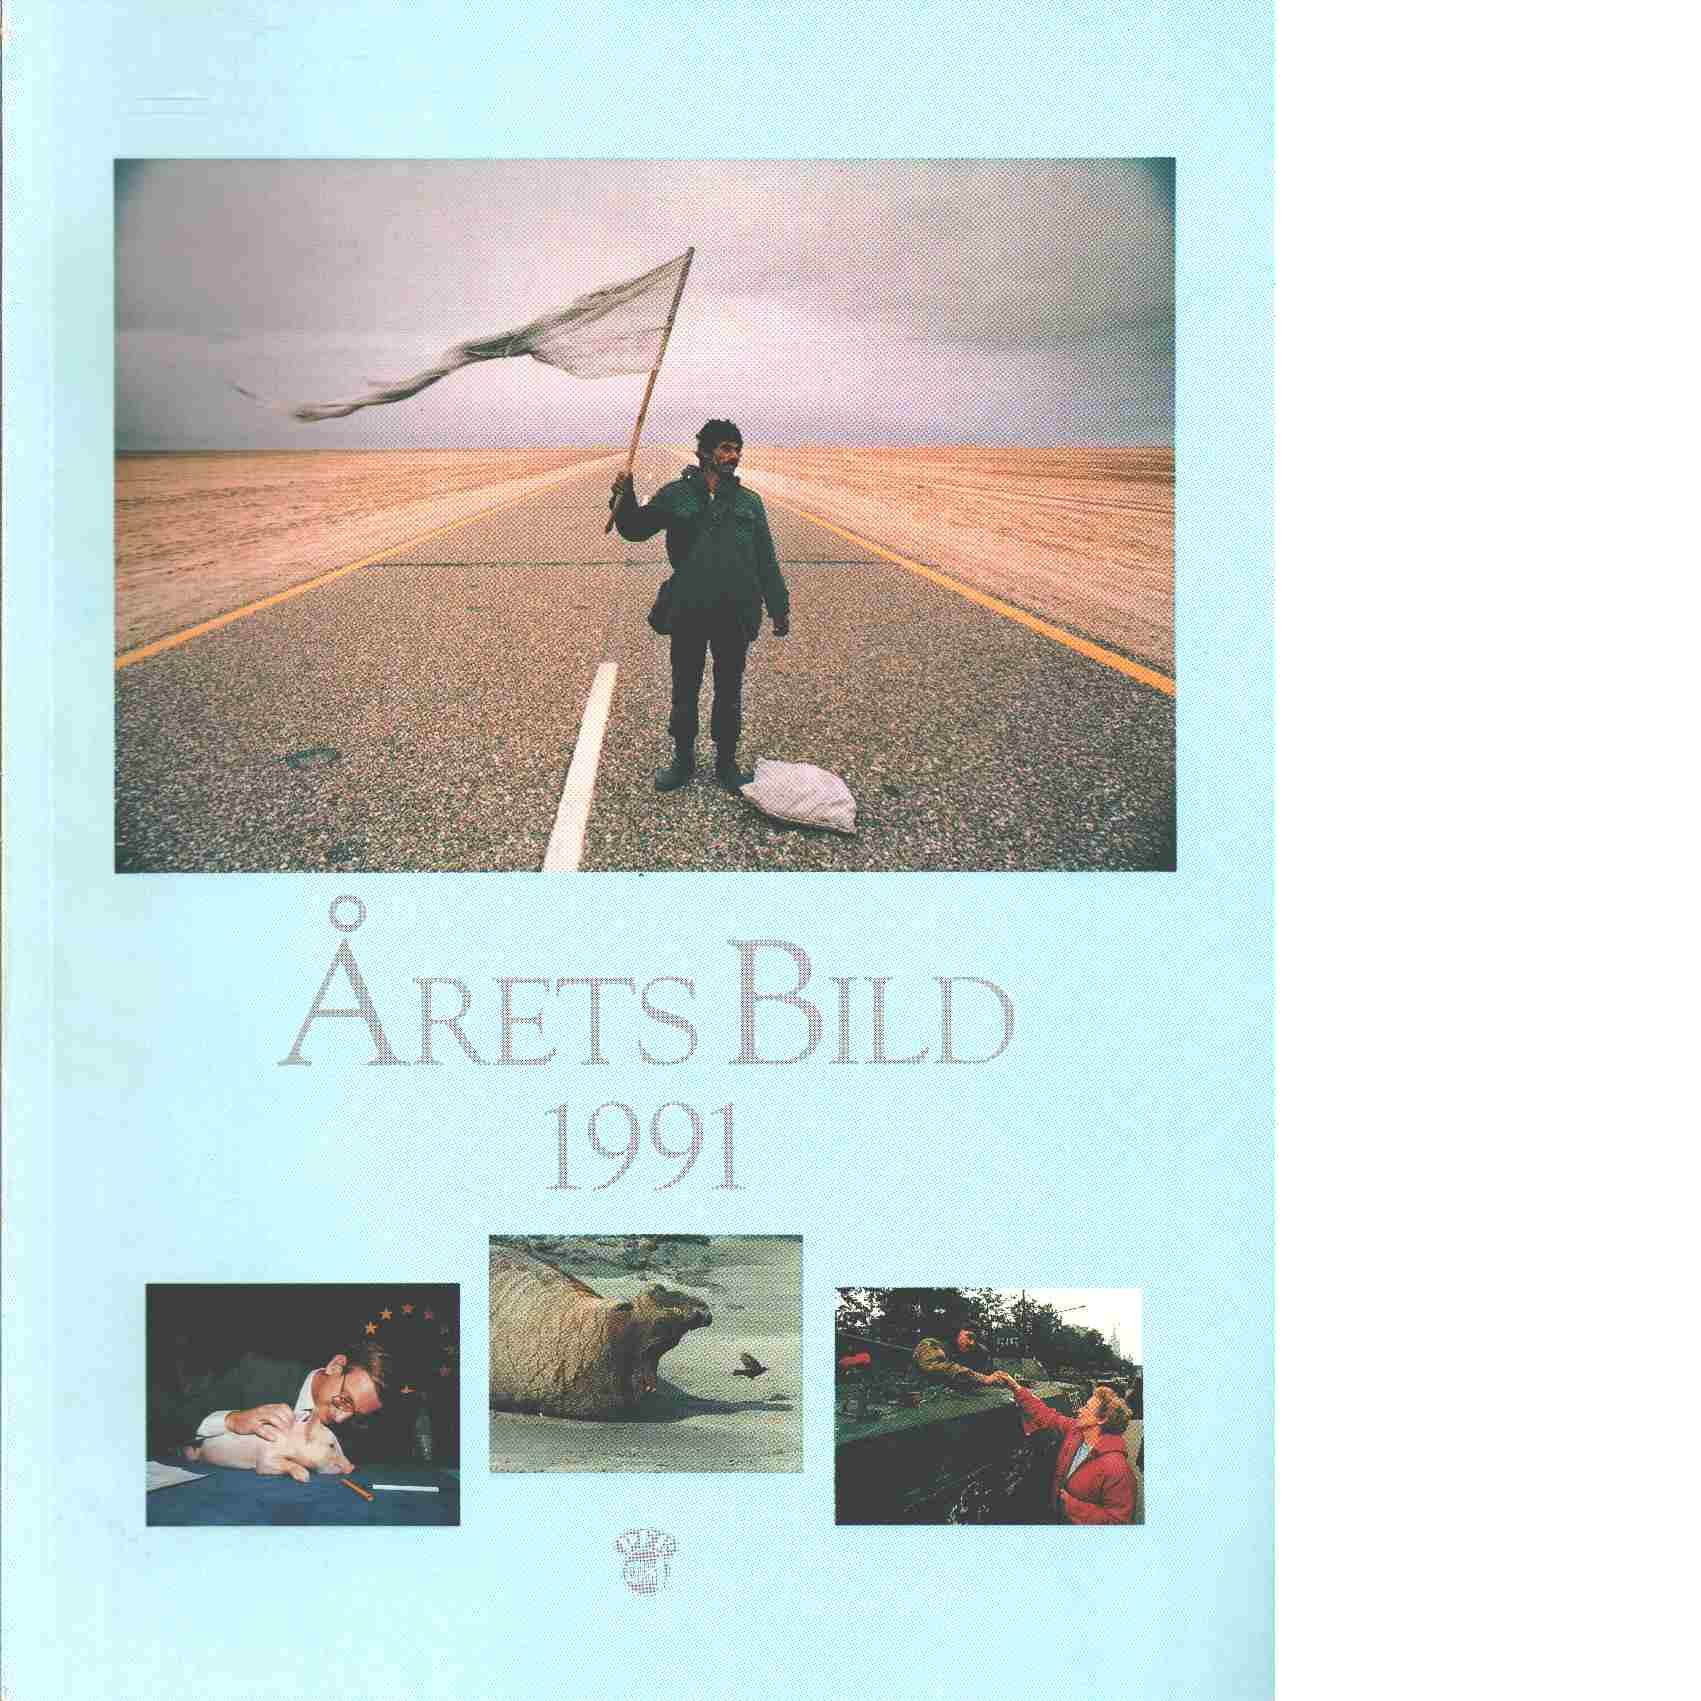 Årets bild 1991 - Red. Widing, Peter